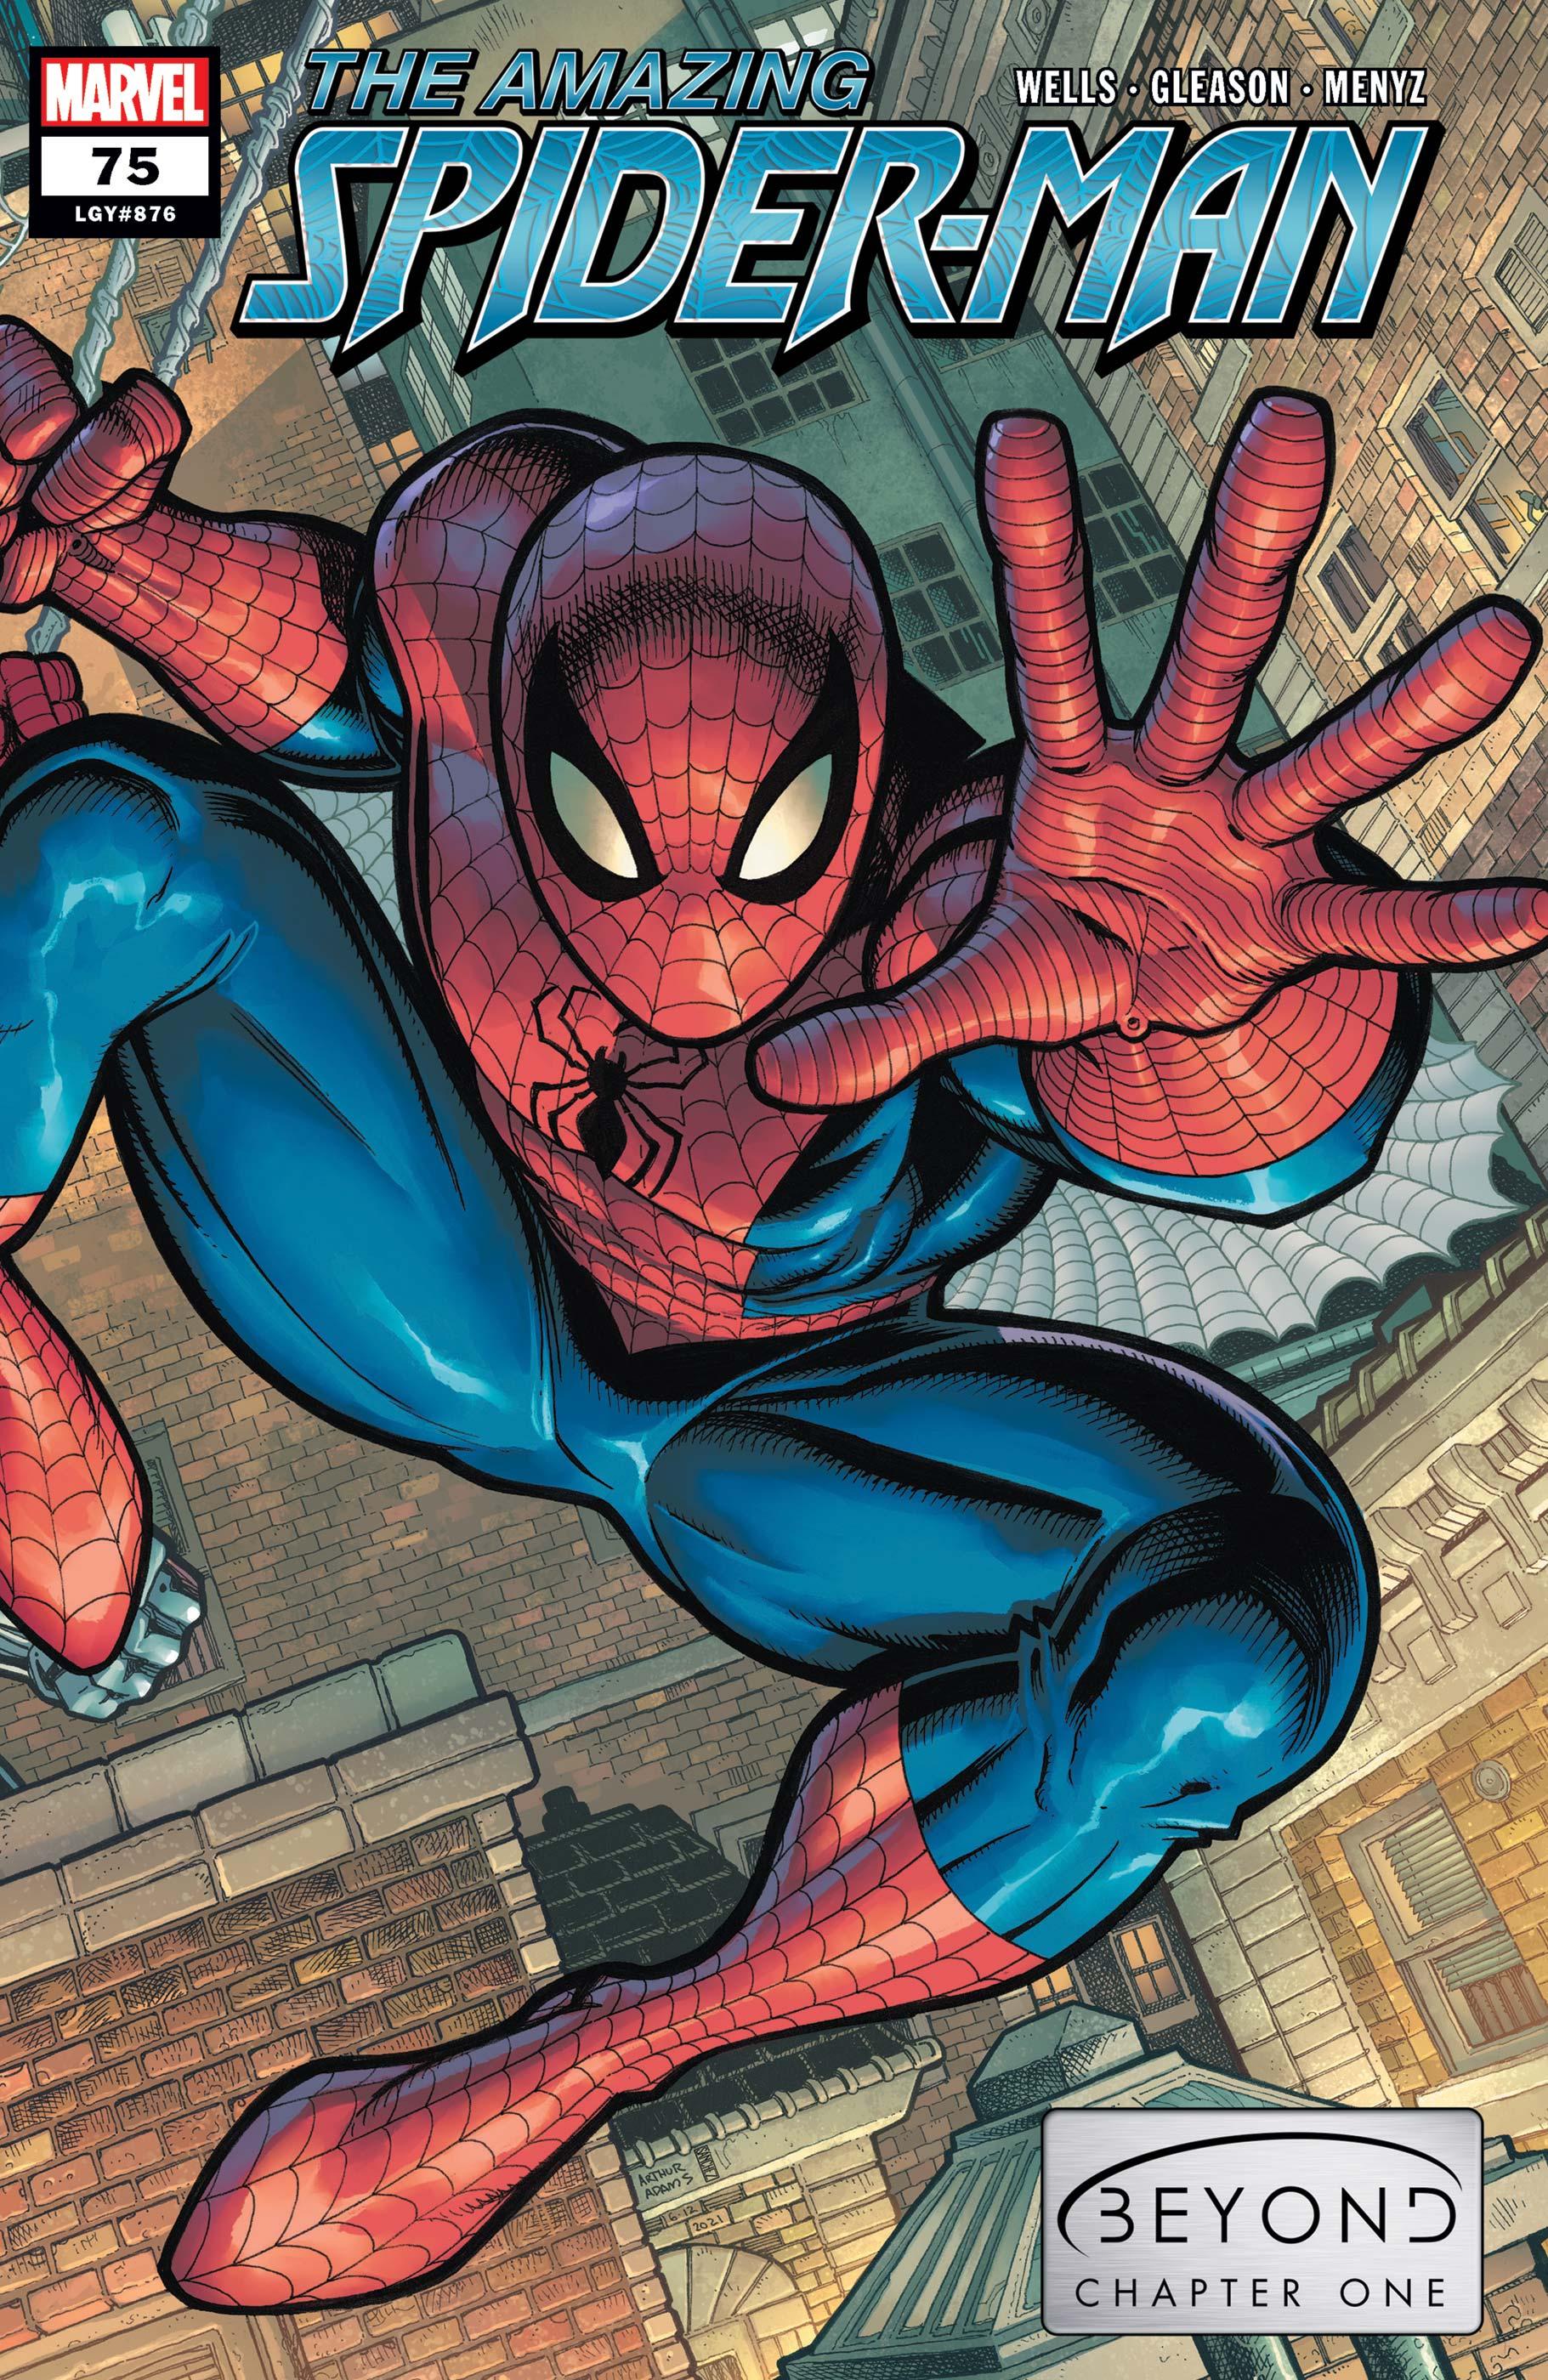 The Amazing Spider-Man (2018) #75